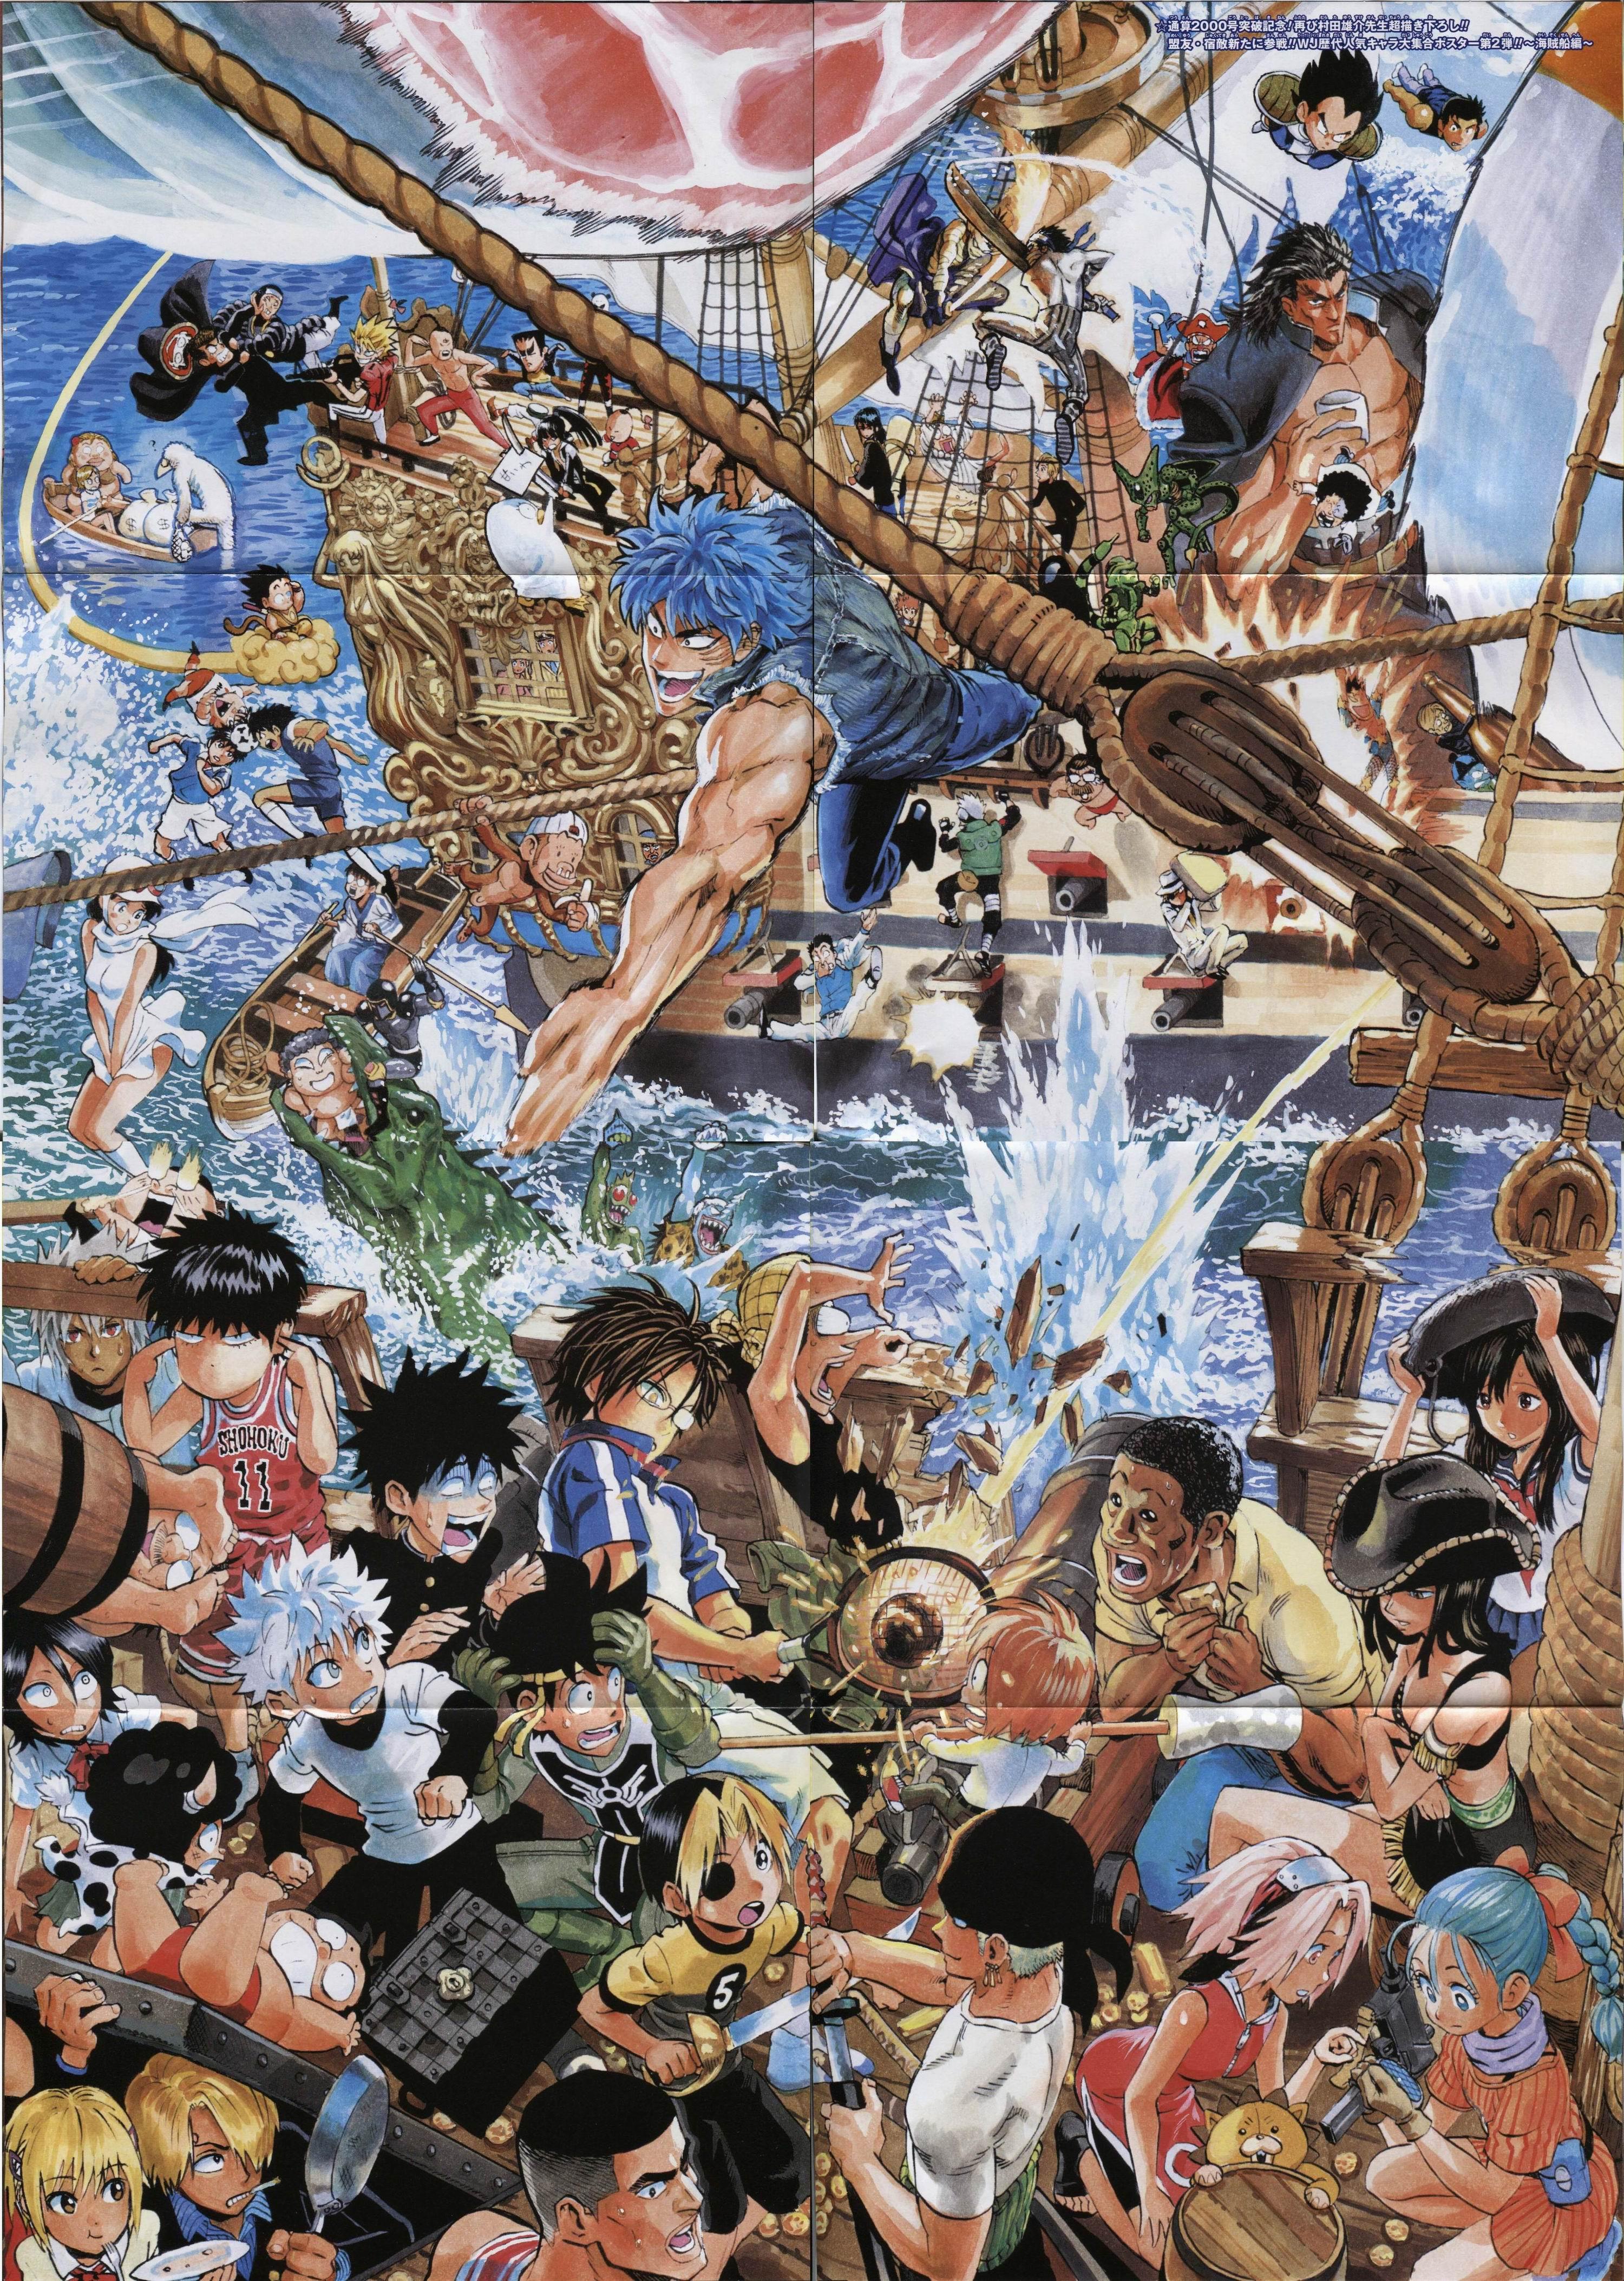 Wallpaper Shonen Jump : wallpaper, shonen, Anime, Shonen, Wallpapers, Wallpaper